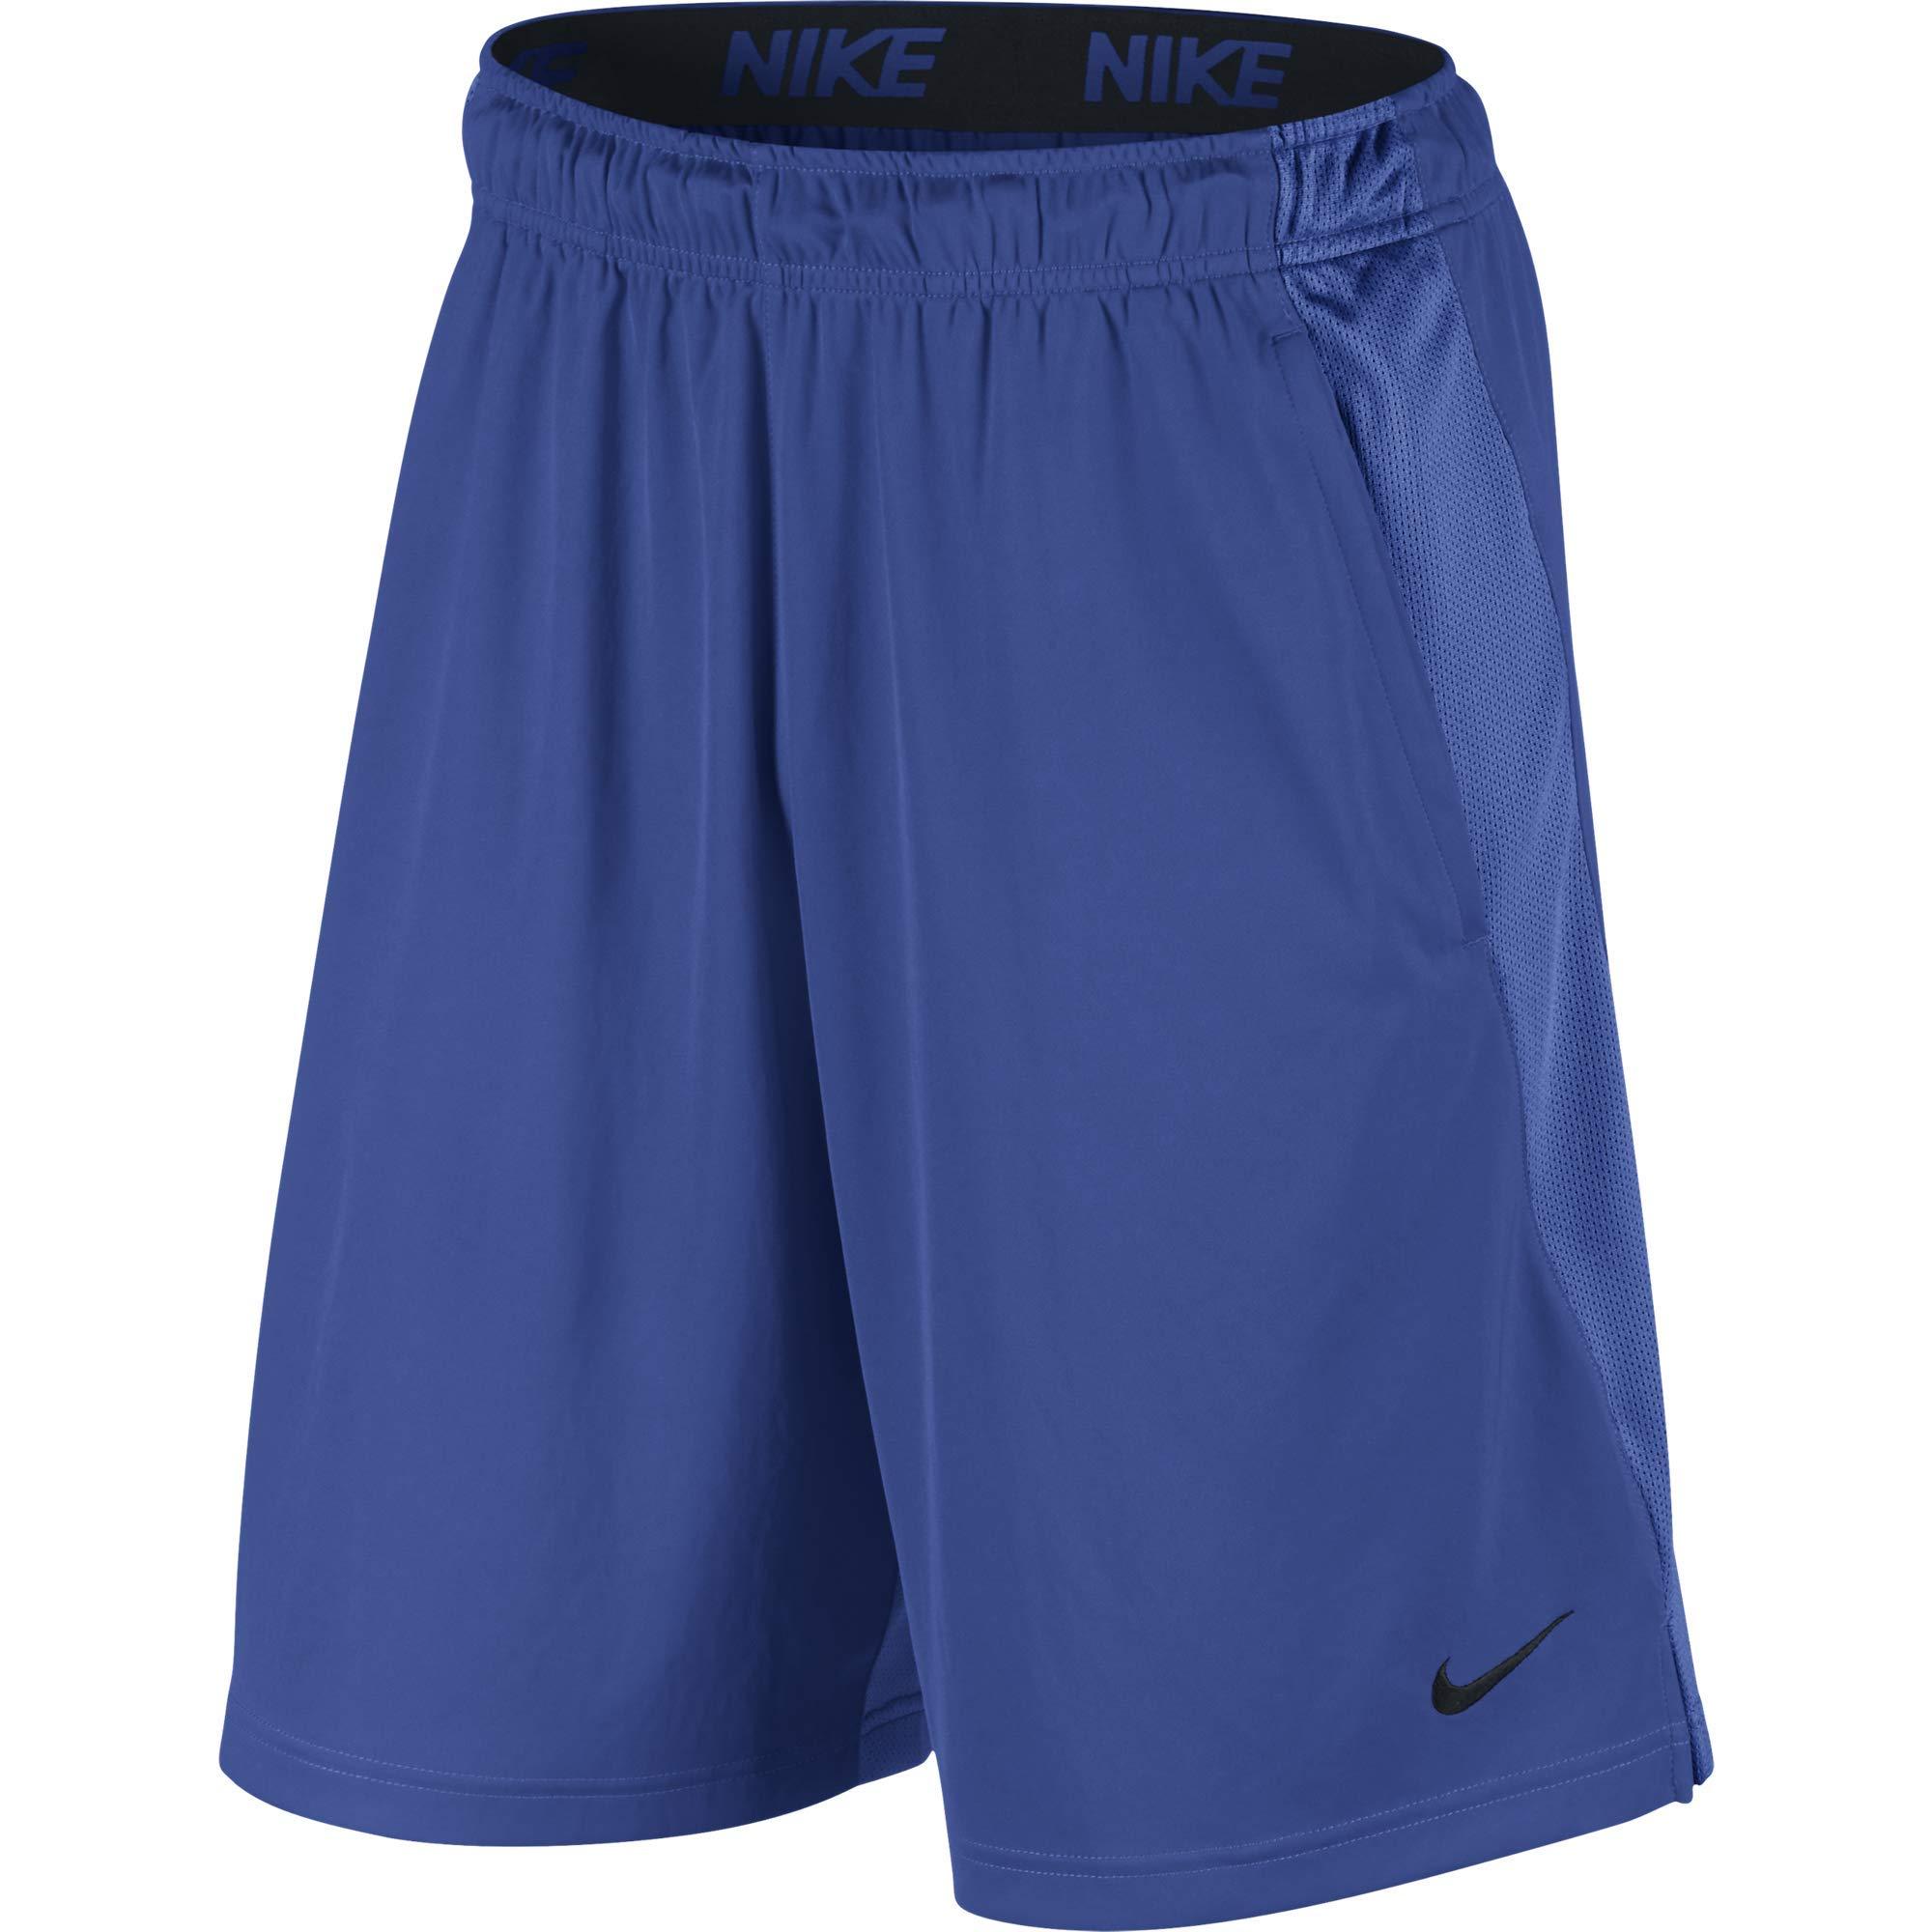 Nike Men's Dry Training Shorts, Game Royal/Game Royal/Black, XXX-Large by Nike